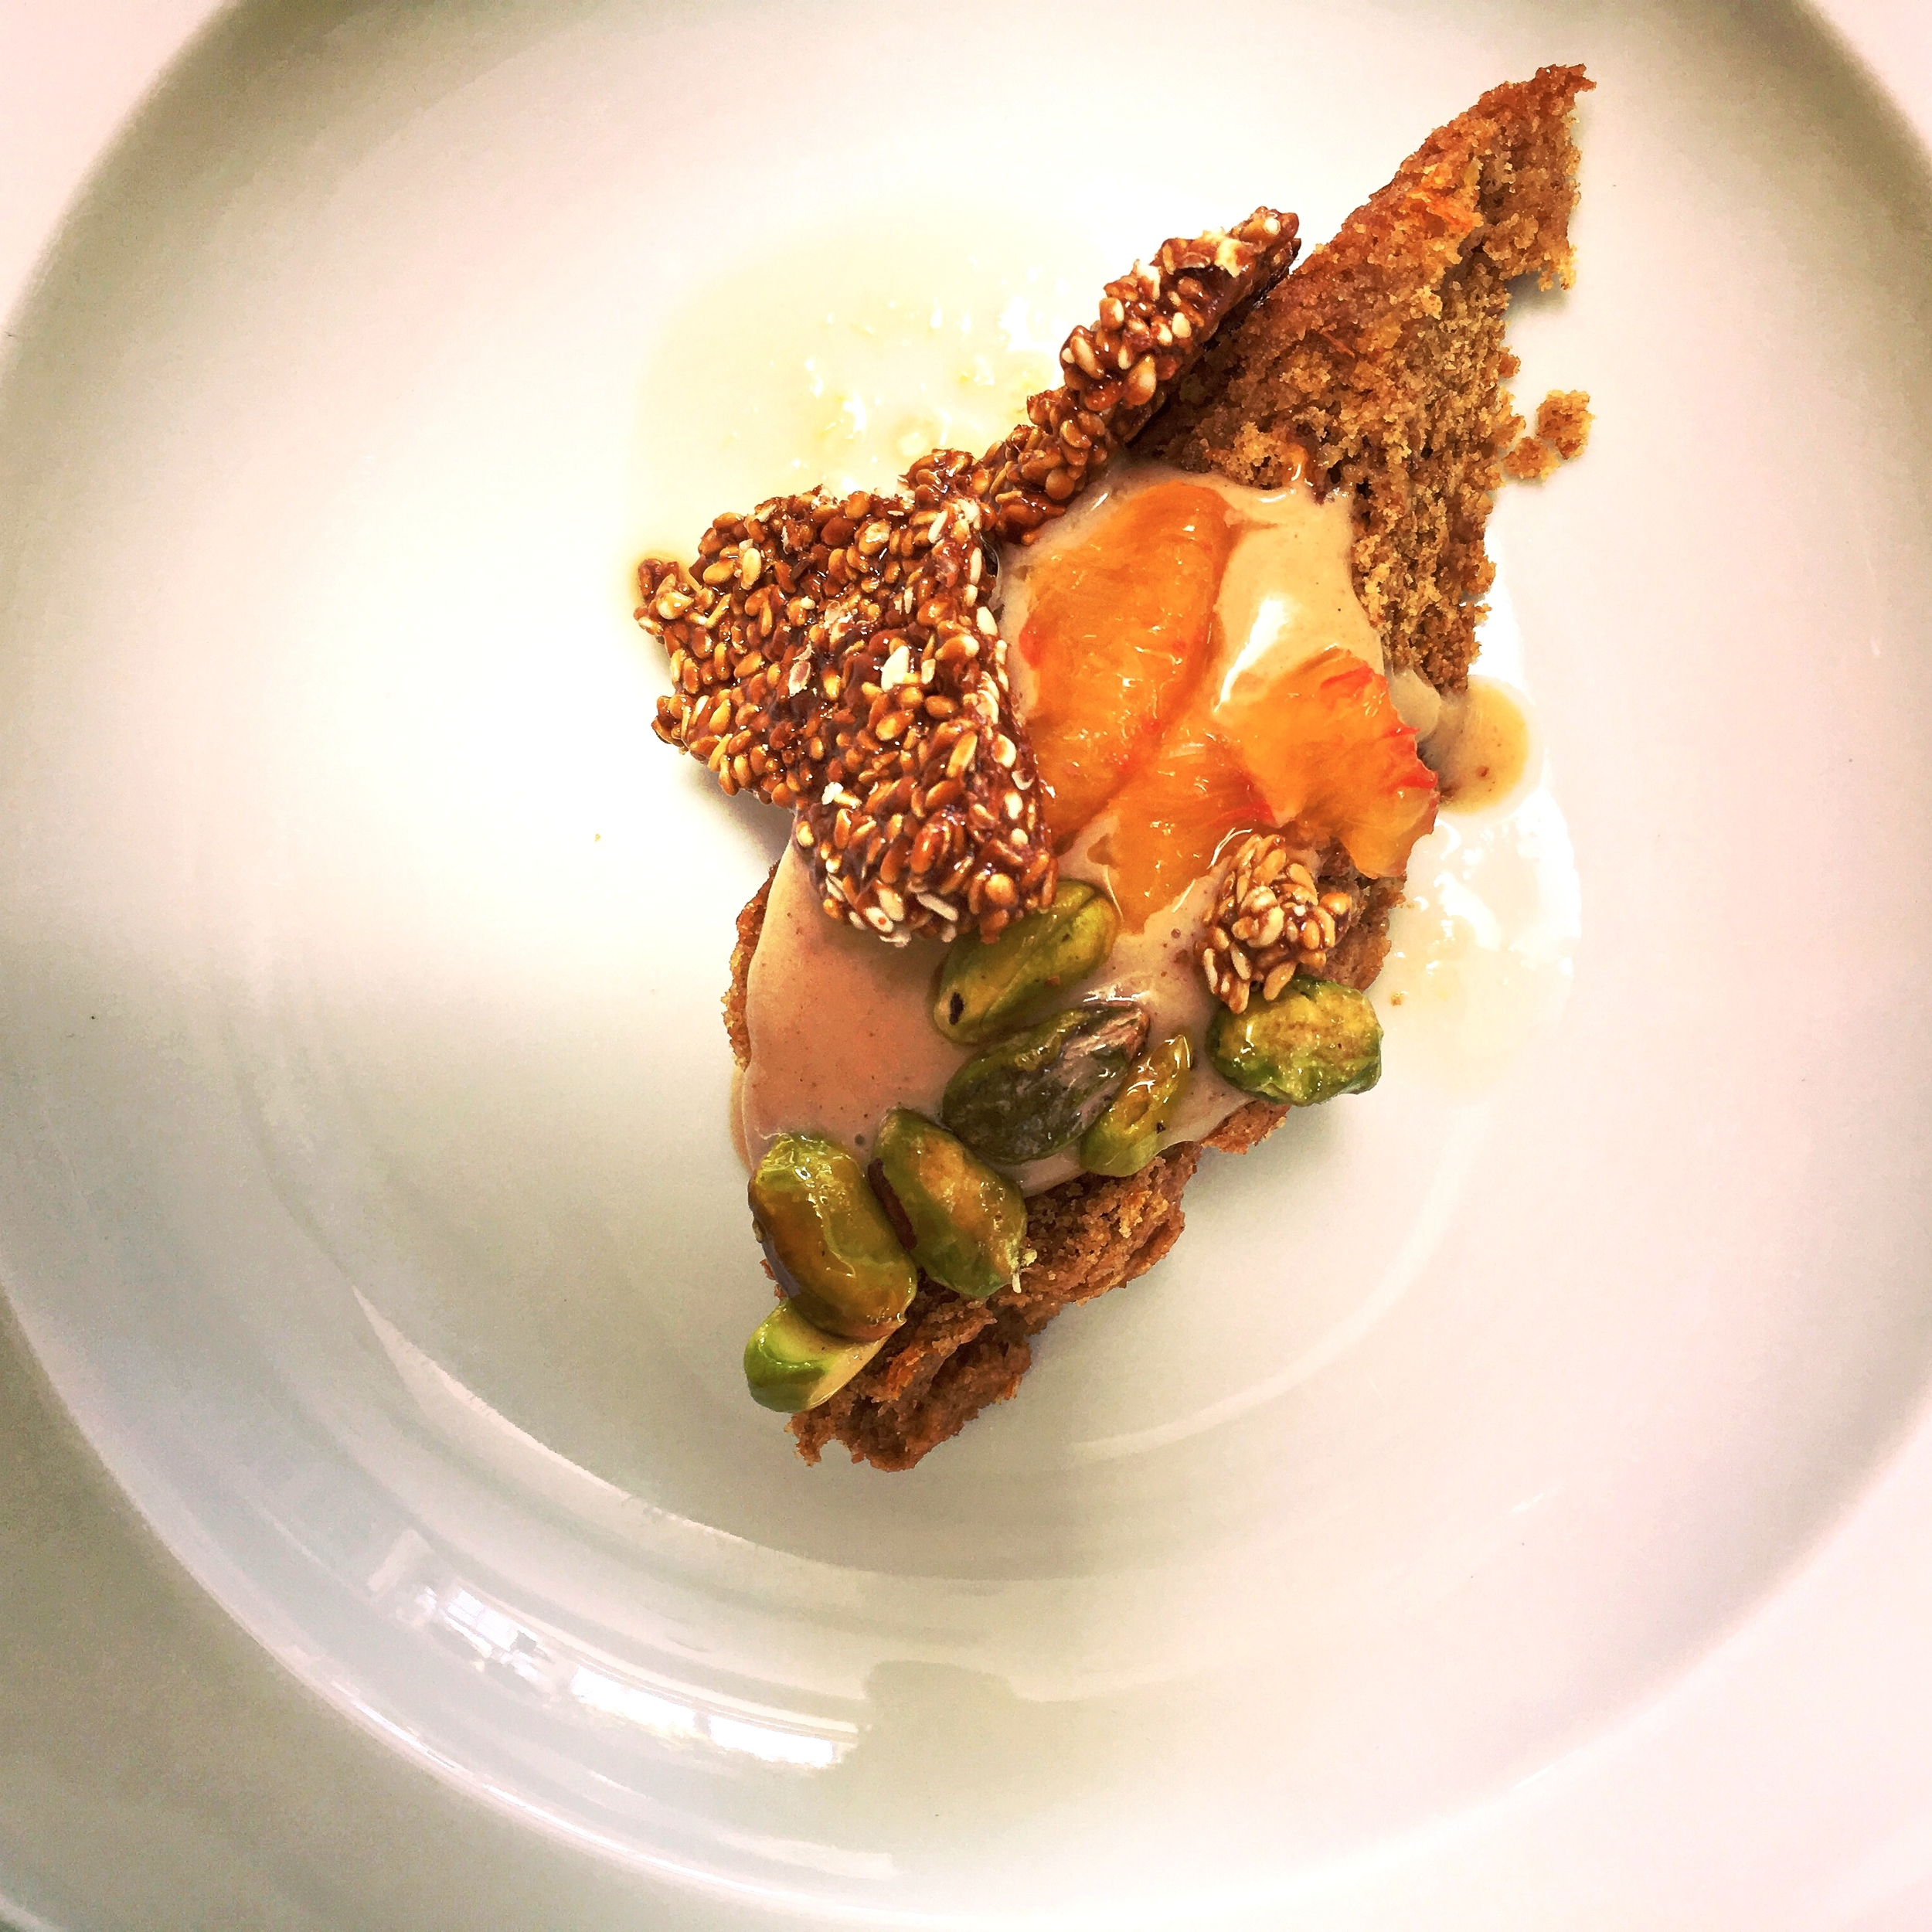 Healthy take on tahinopita- tahini cake with orange tahini sauce, maple pistachio and sesame snap